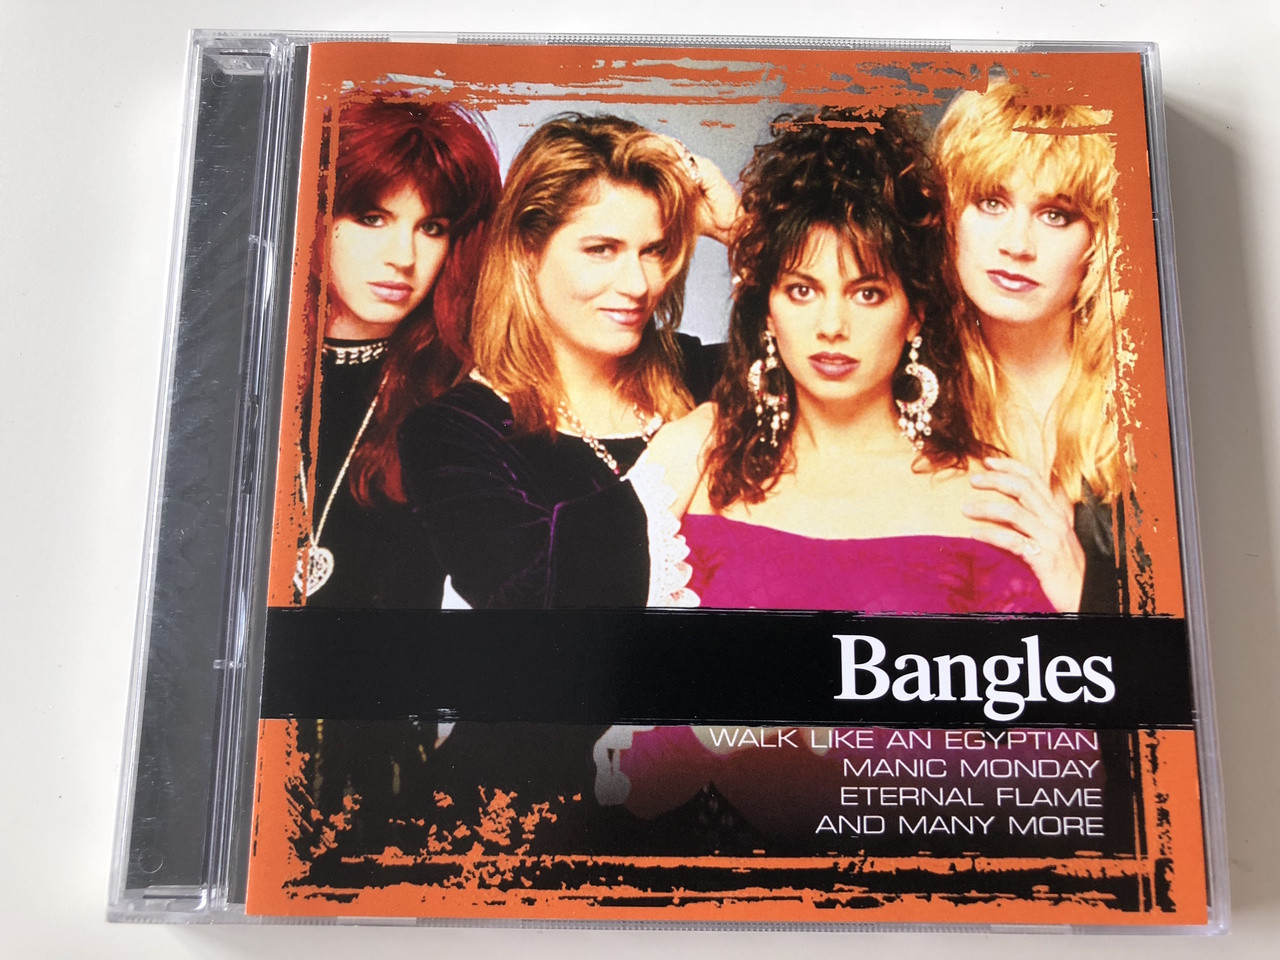 b181116ca4d38 Bangles / Collections / Audio CD 2005 / Susanna Hoffs, Debbi Peterson,  Vicki Peterson, Michael Steele, Annette Zilinskas / Made in Europe